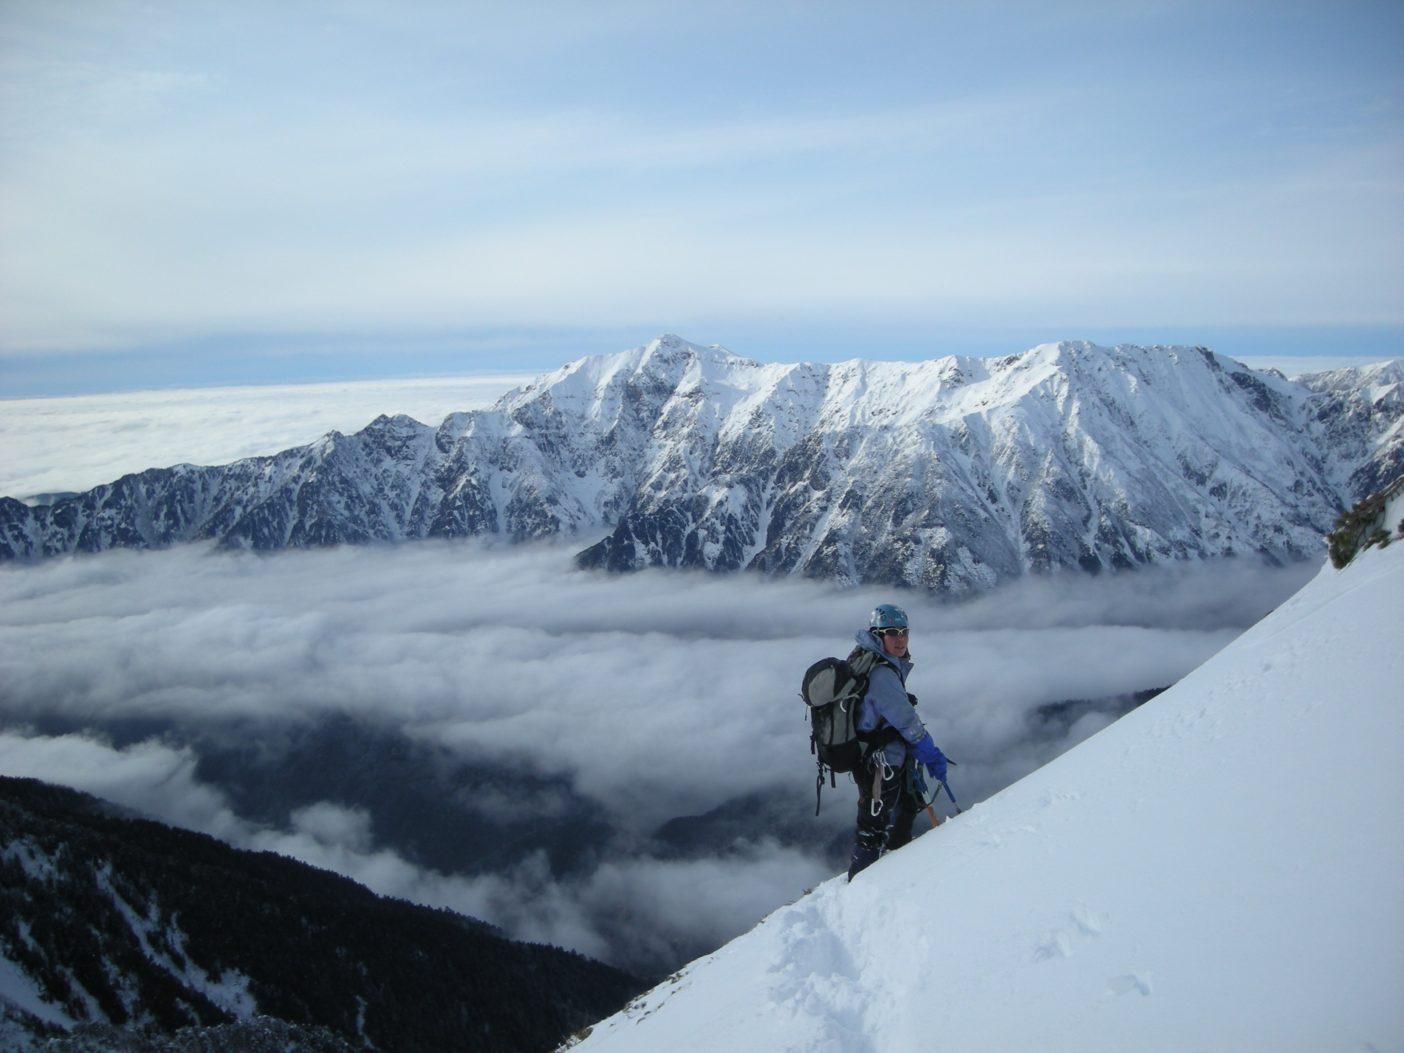 北アルプス飛騨尾根。2009年12月 写真:鈴木啓紀